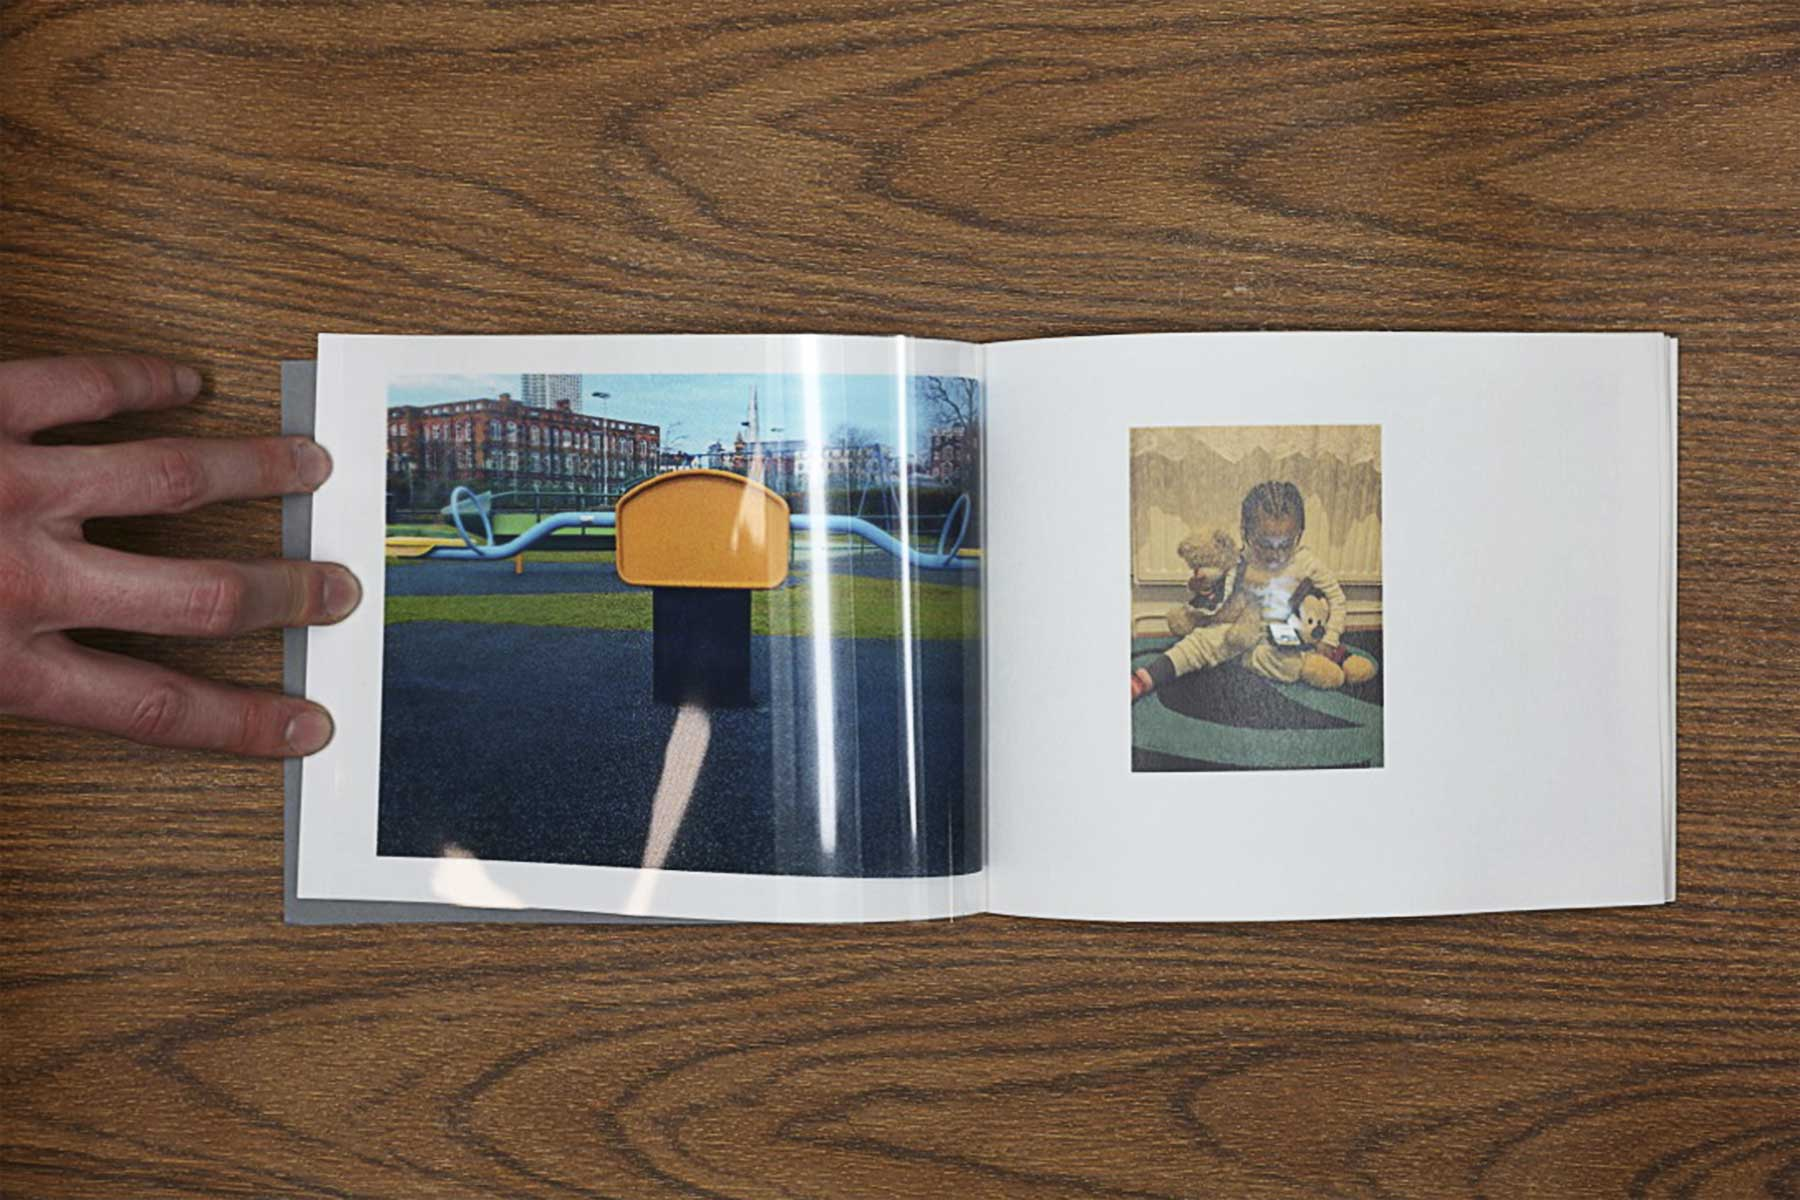 photobook-pop-up3-samrawit-01